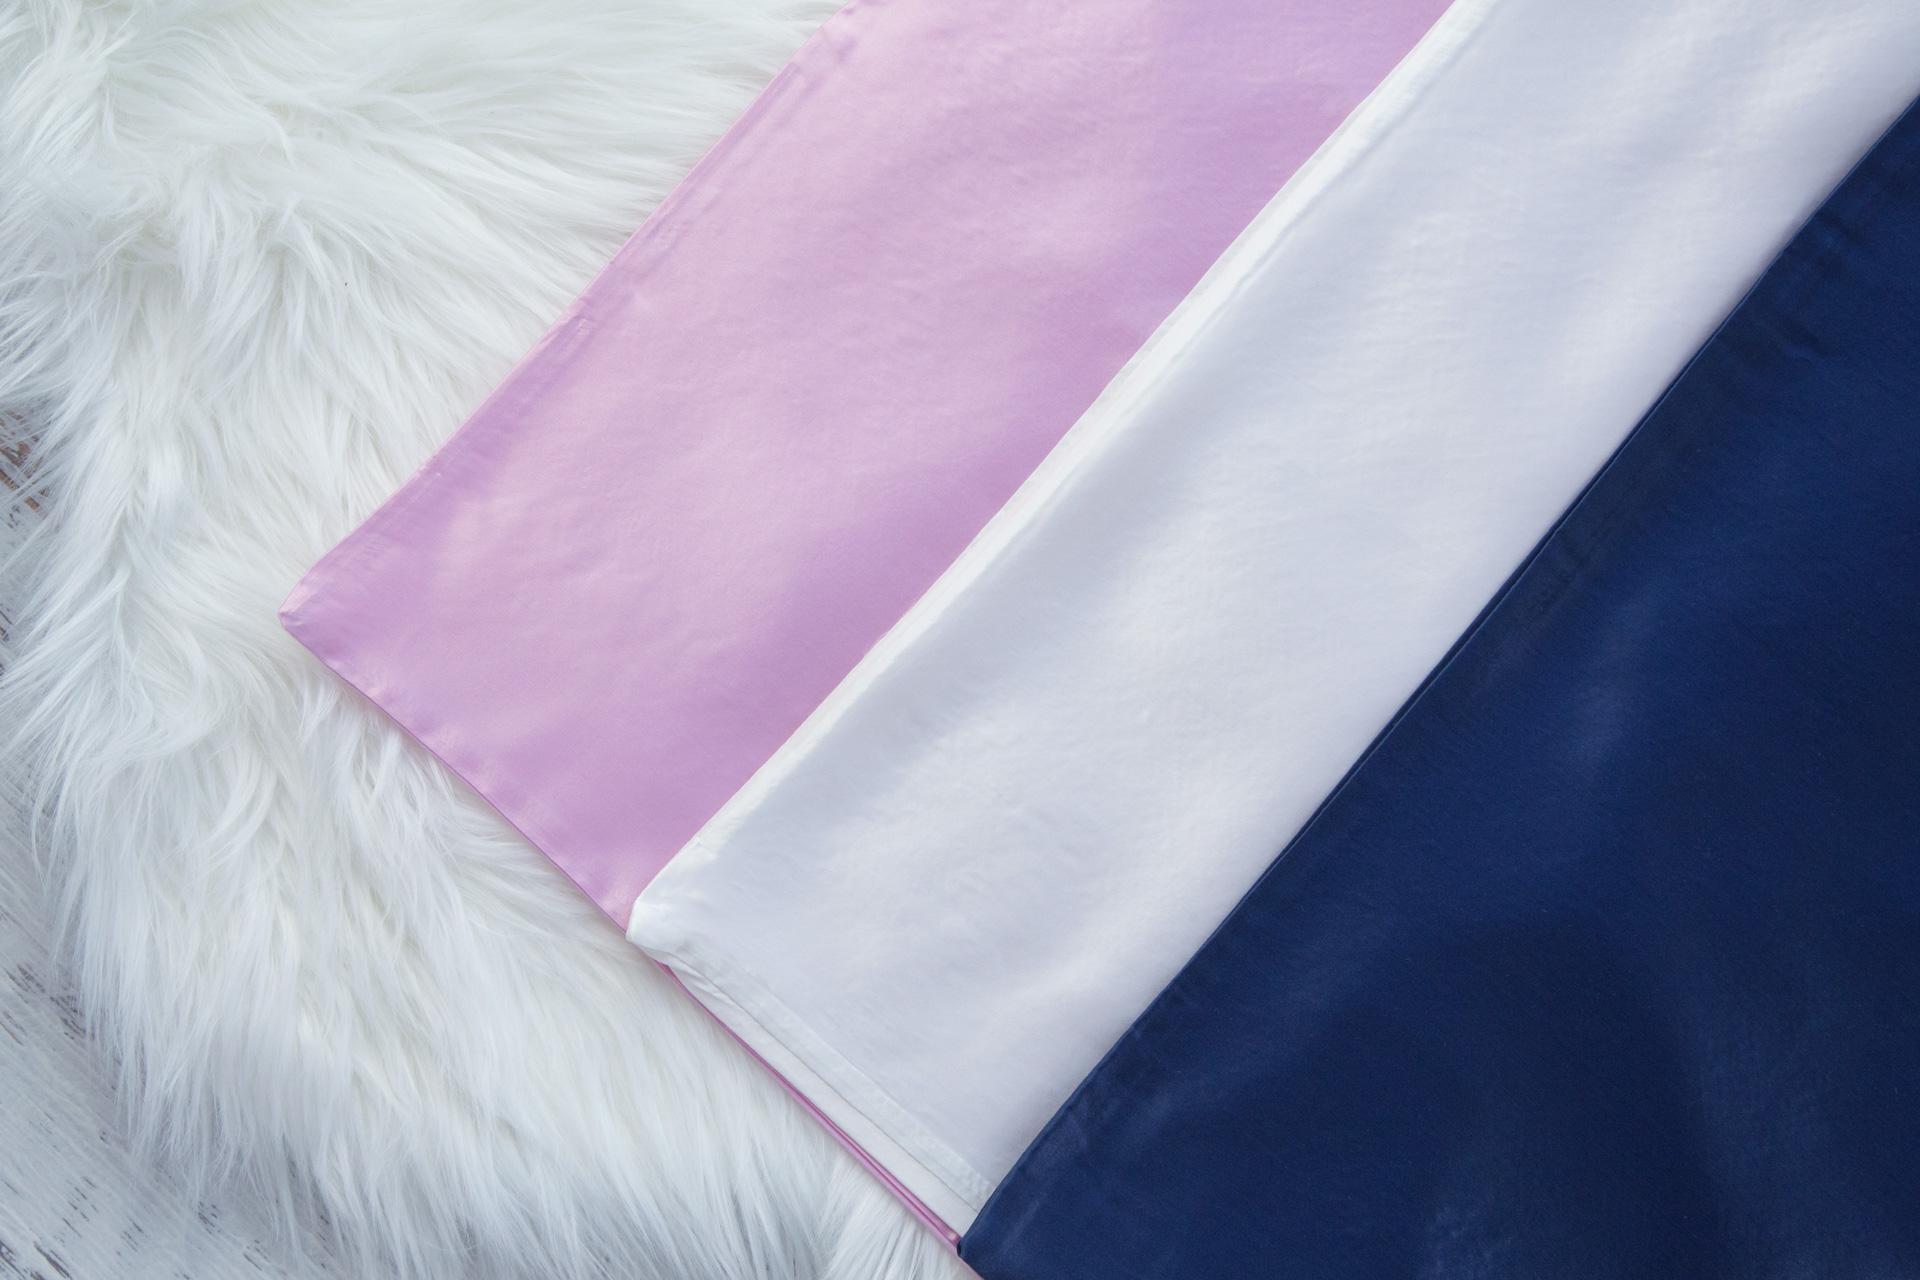 Beautysilks Silk Pillow Cases